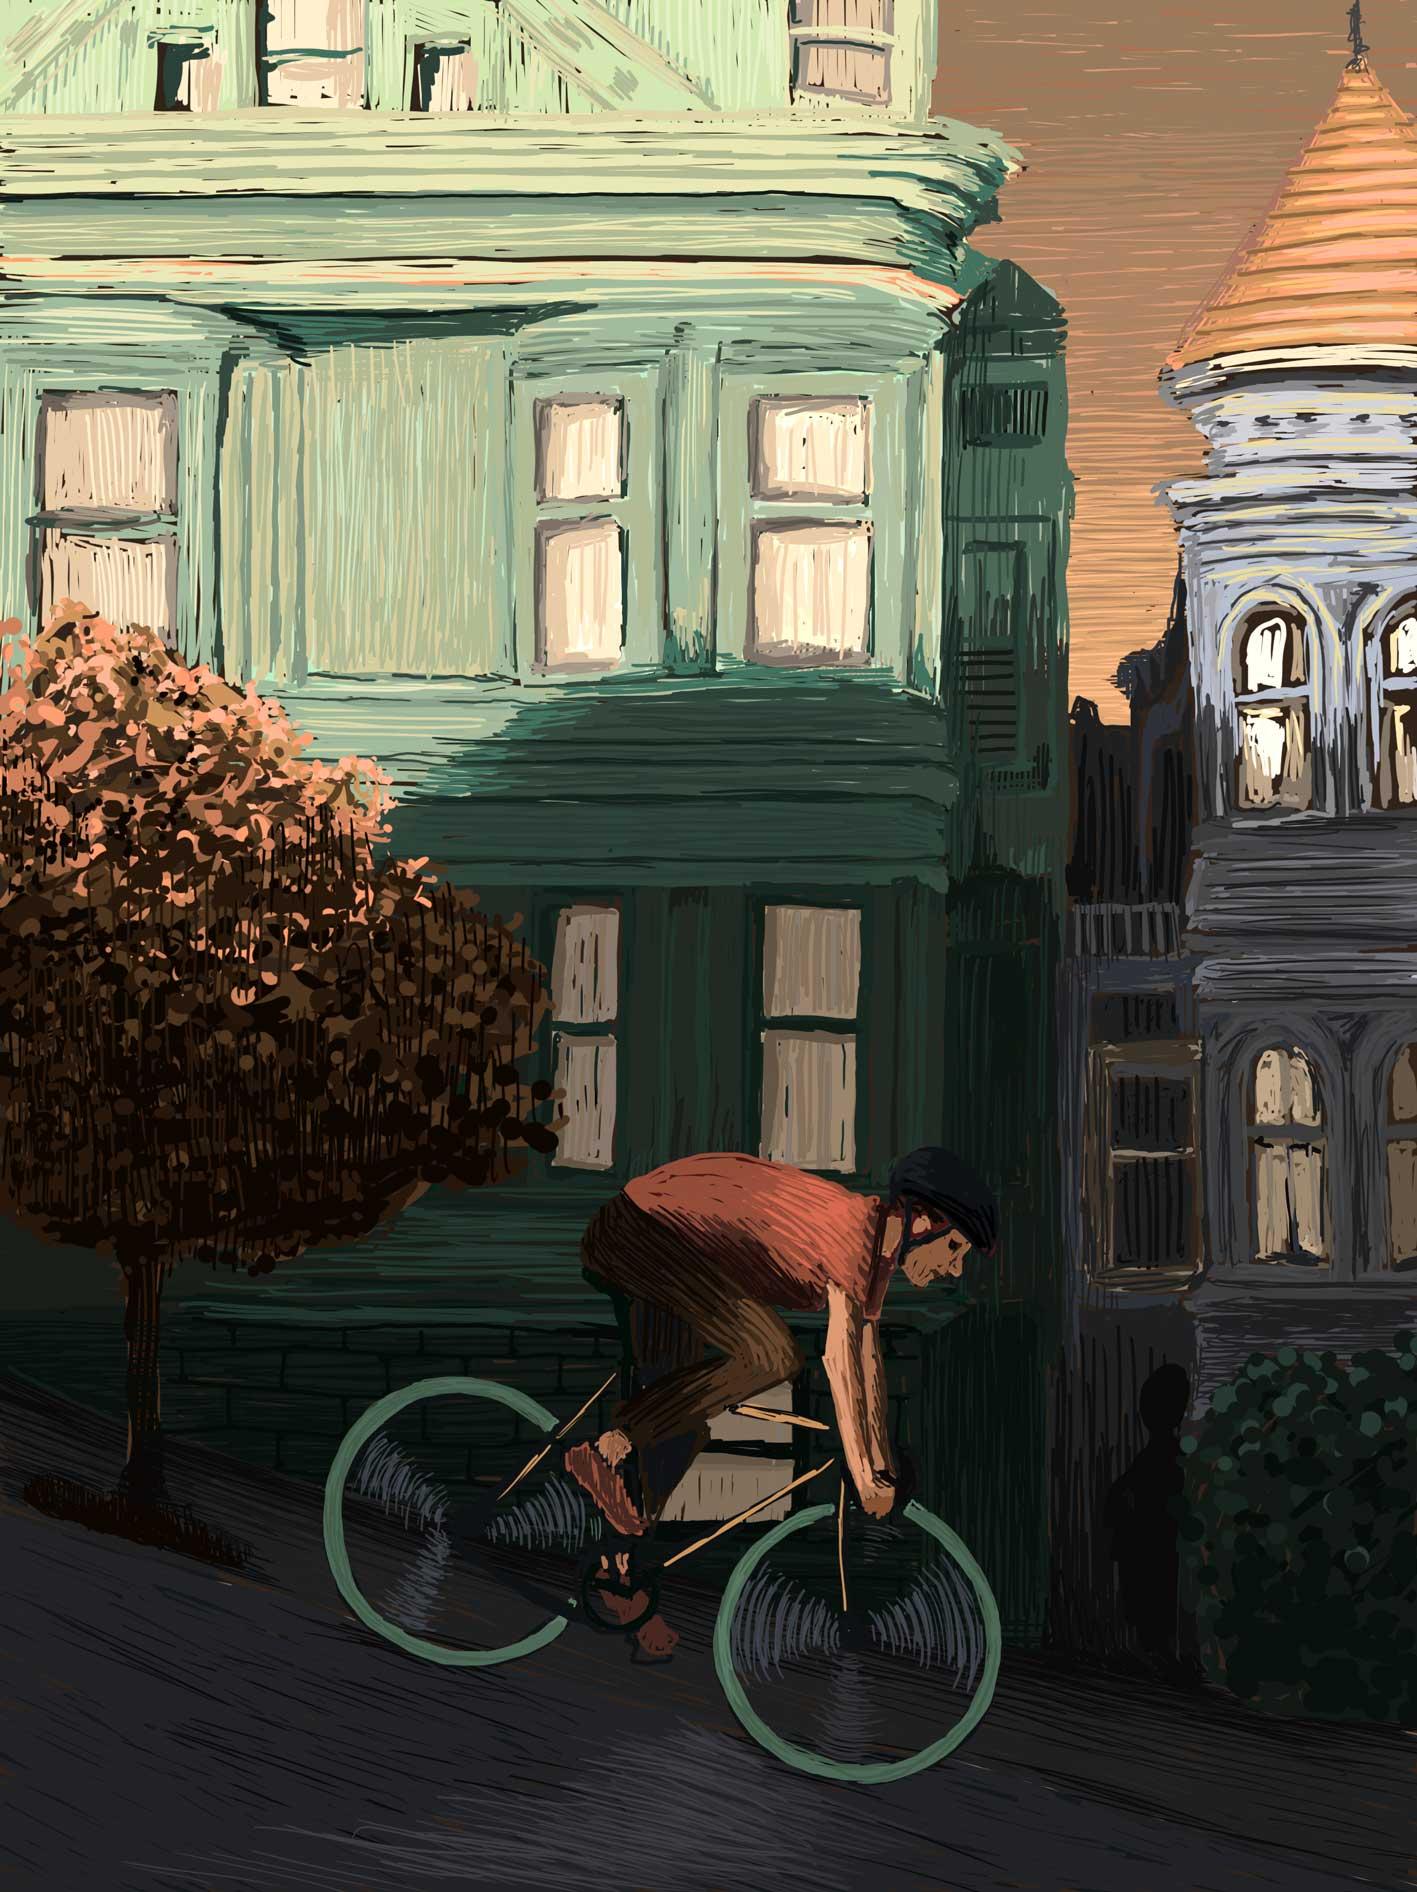 San-Francisco Bike Ride – Digital Illustration. A Cyclist rolling downhill in San Francisco. San-Francisco Bike Ride – limited Fine Art Print